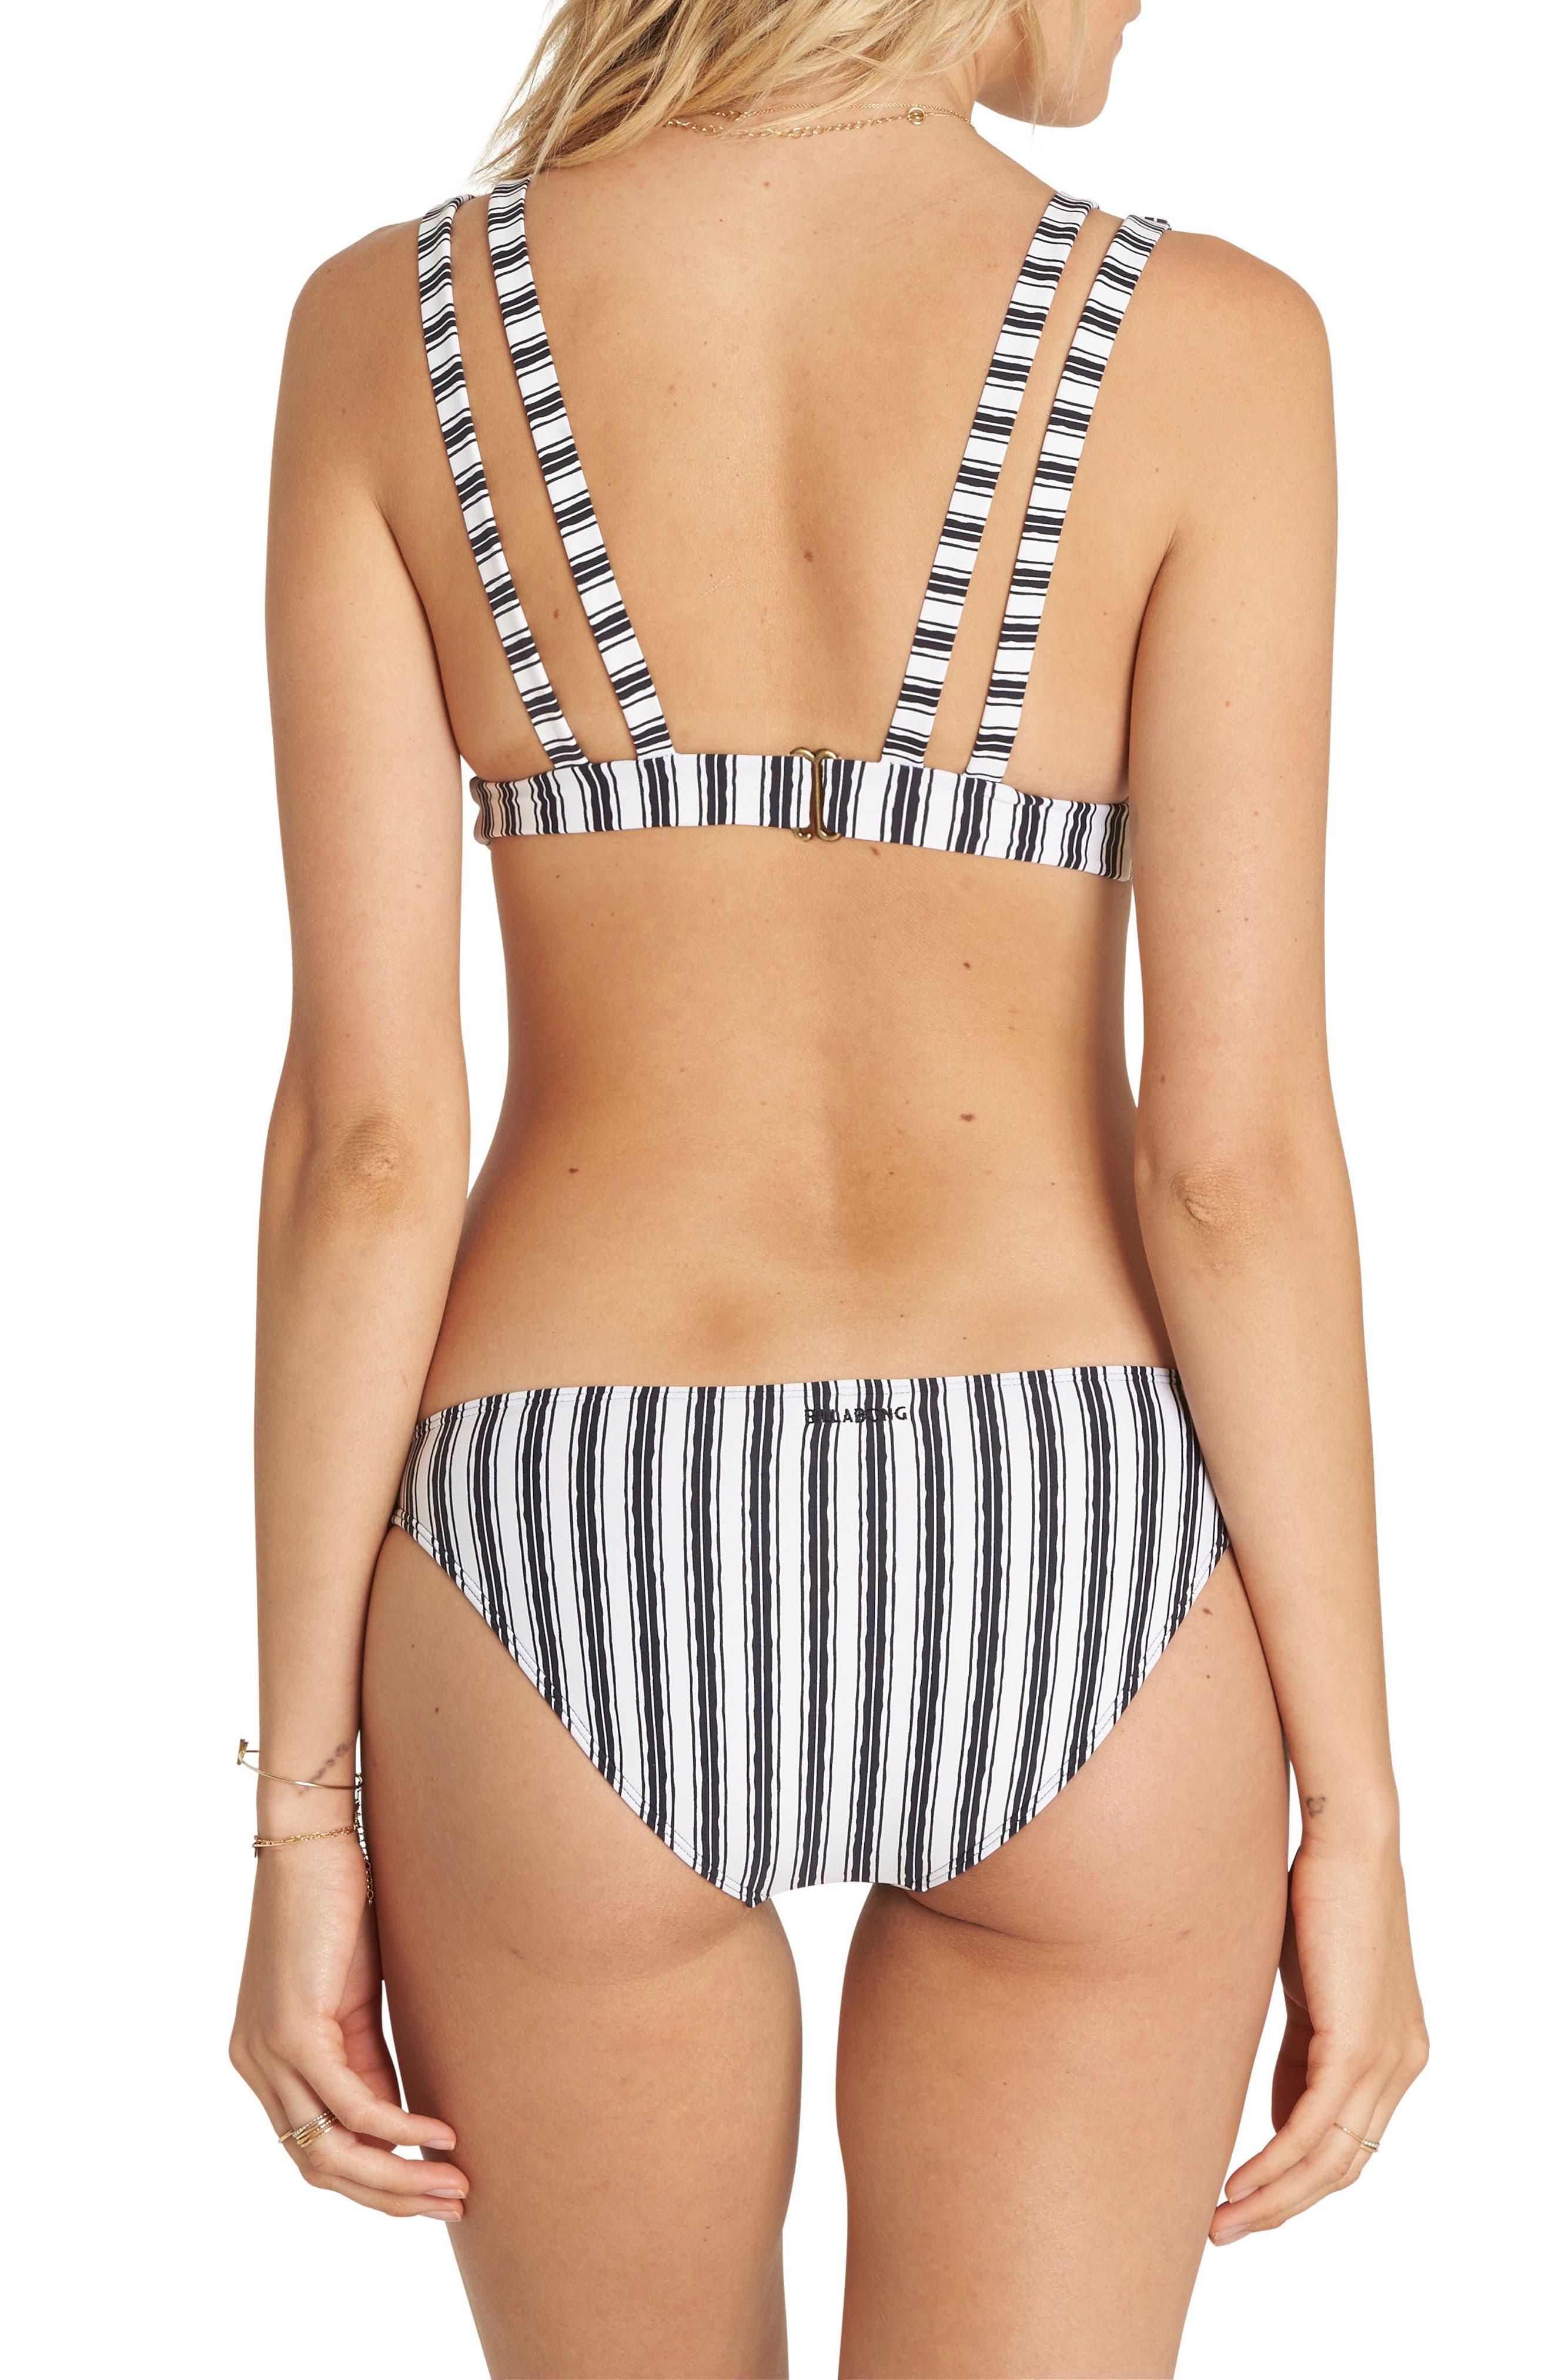 Get in Line Lowrider Bikini Bottoms,                             Alternate thumbnail 3, color,                             Multi